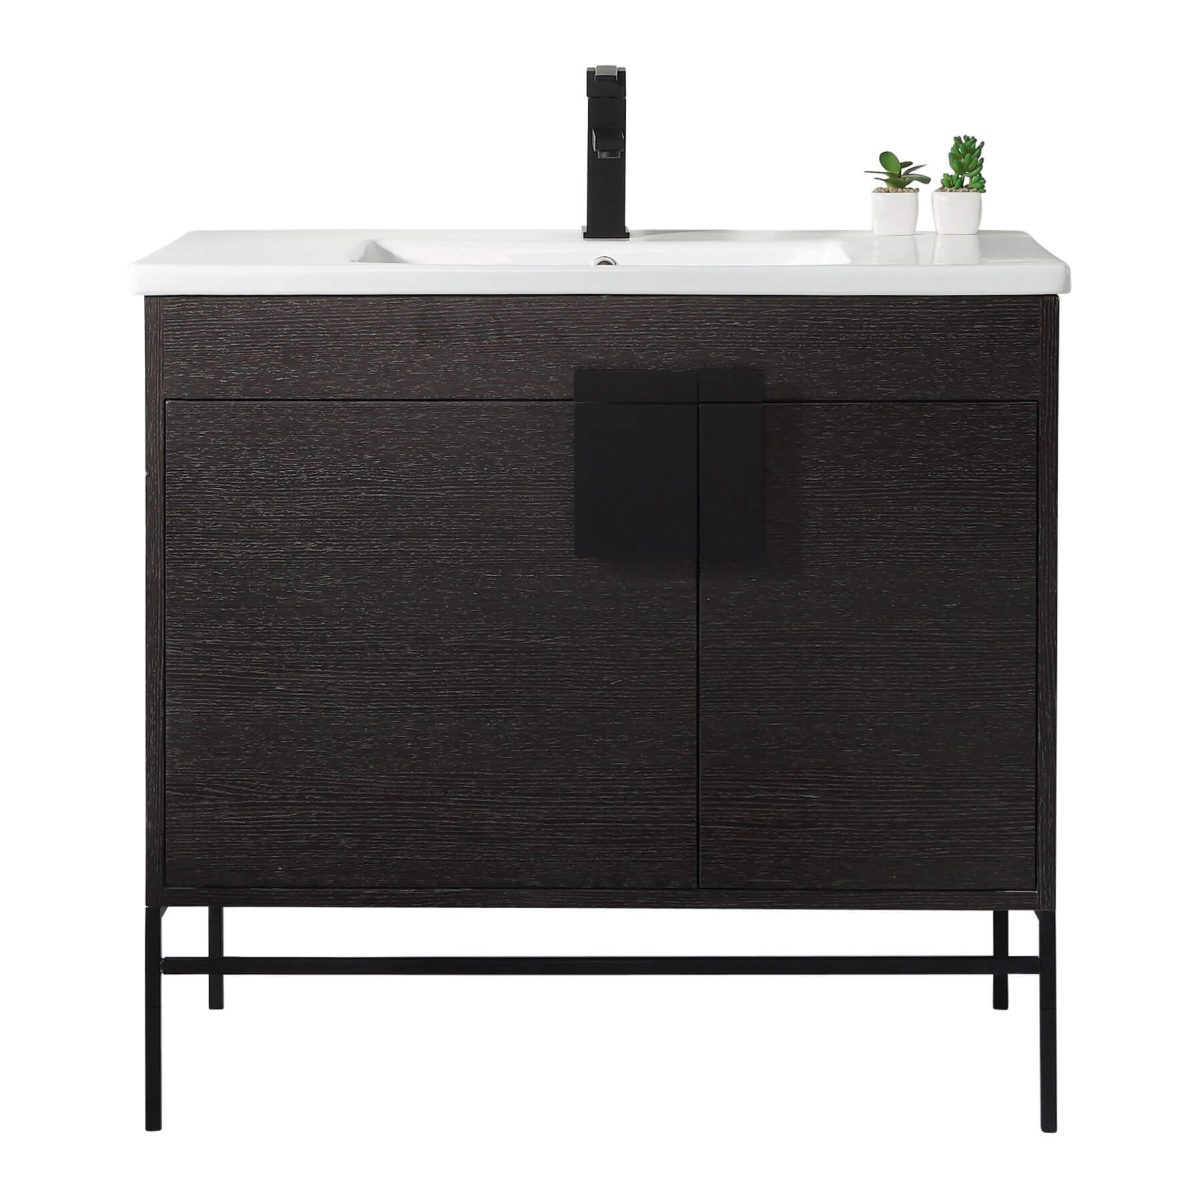 "Shawbridge 36"" Modern Bathroom Vanity  Black Oak Straight Grain with Black Hardware"